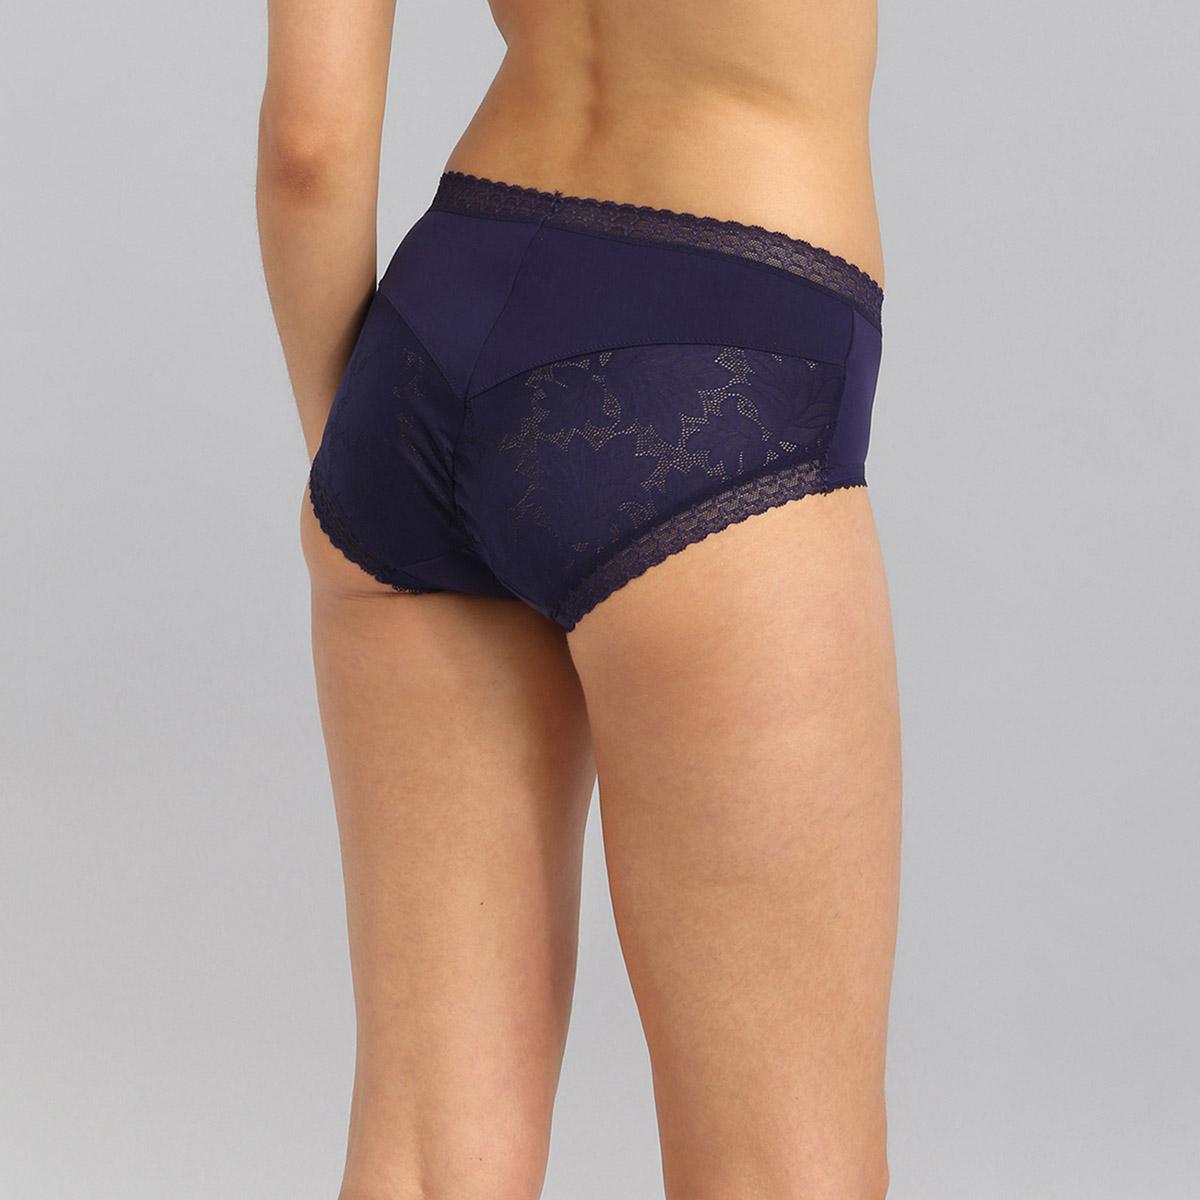 Culotte midi dentelle bleu marine Invisible Elegance, , PLAYTEX